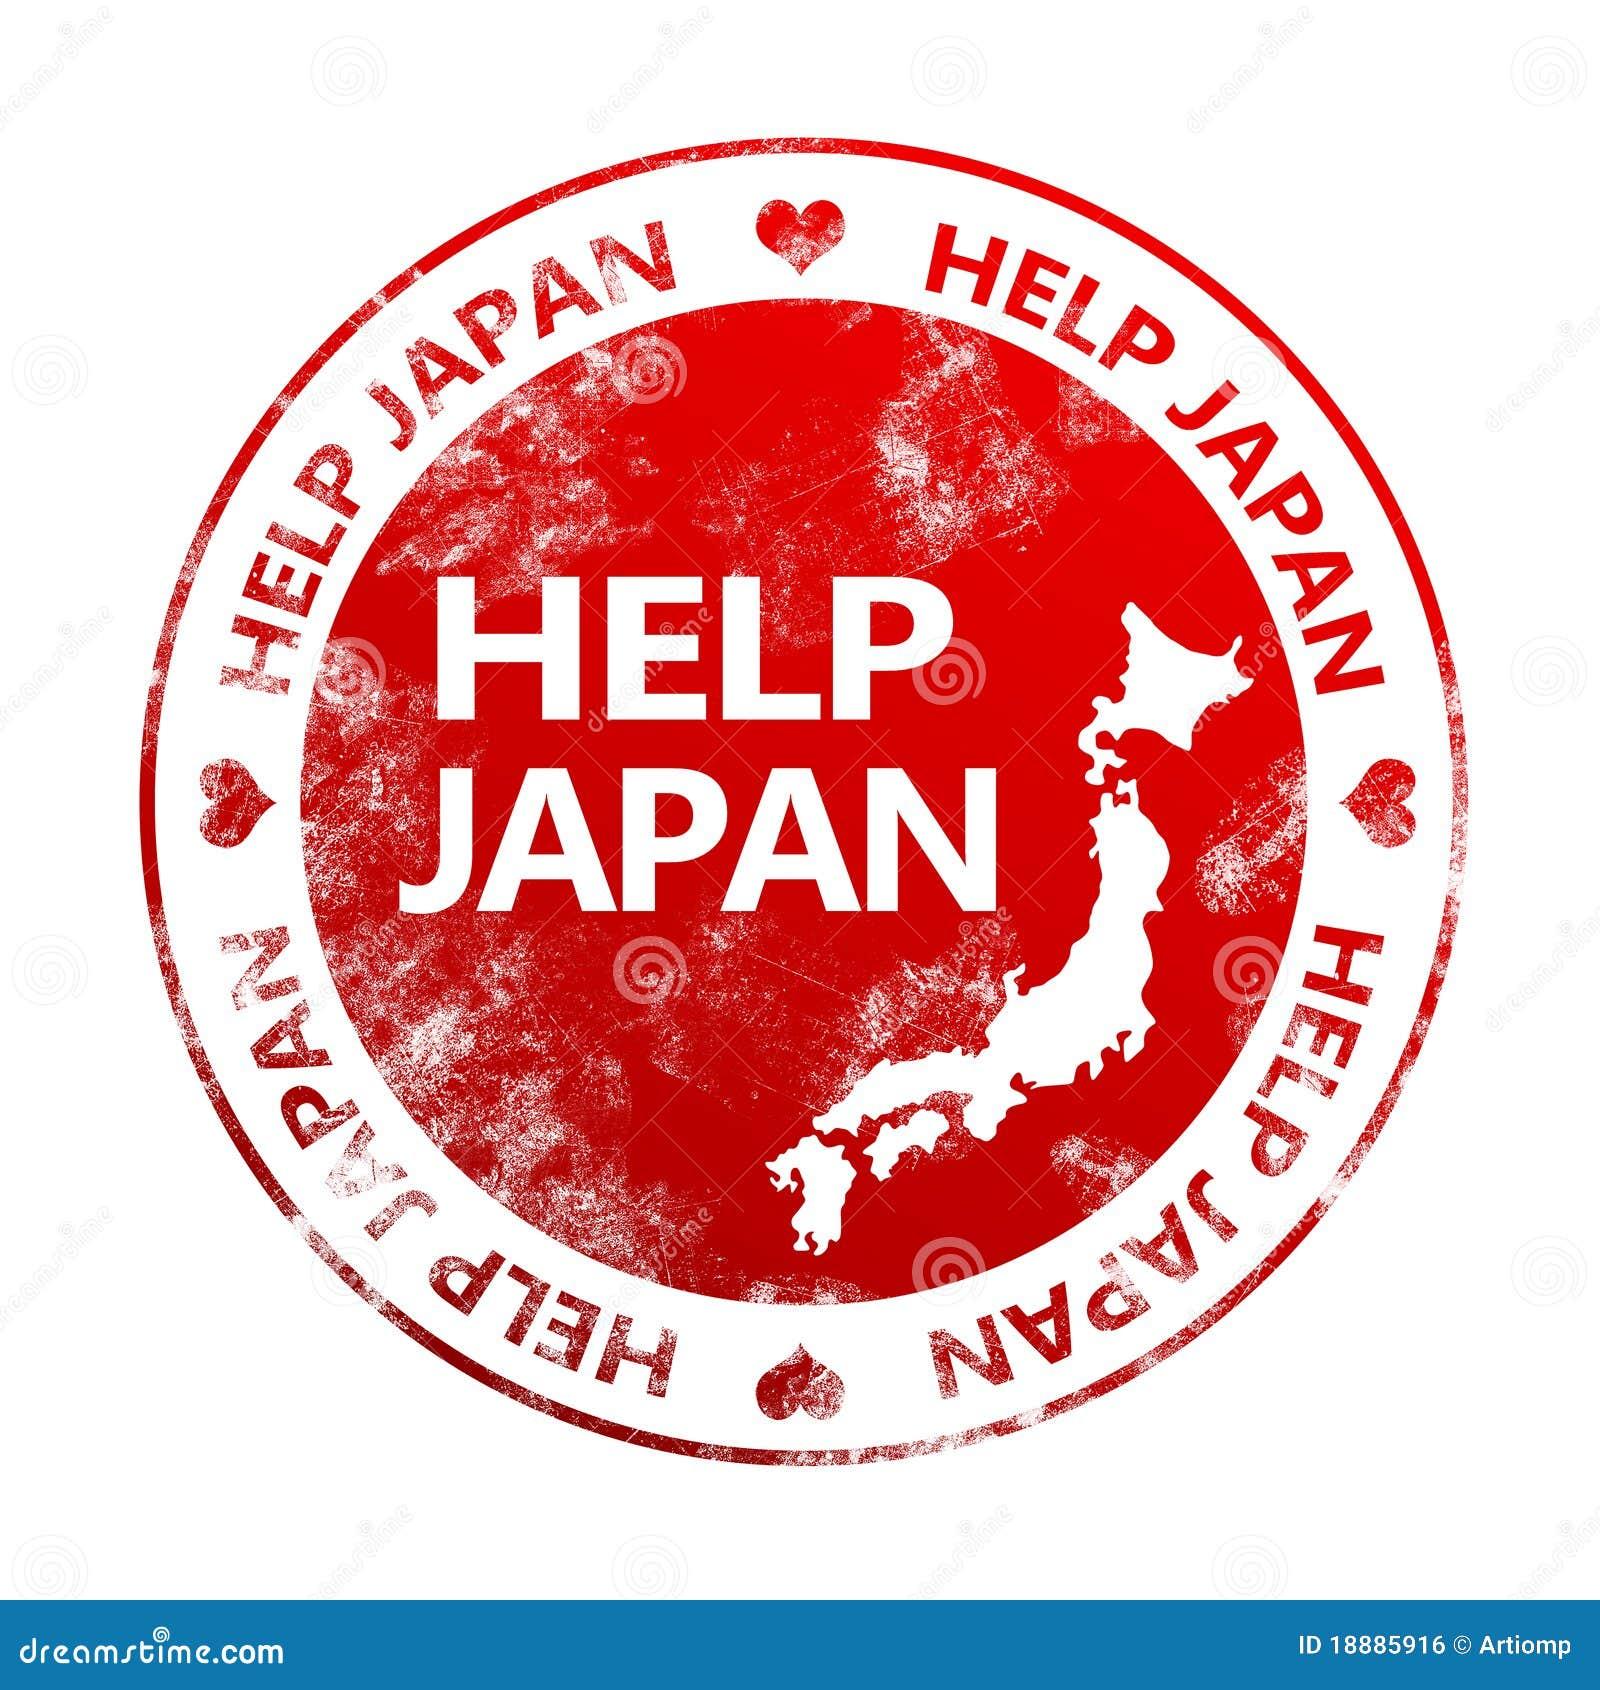 Help japan red grunge stamp